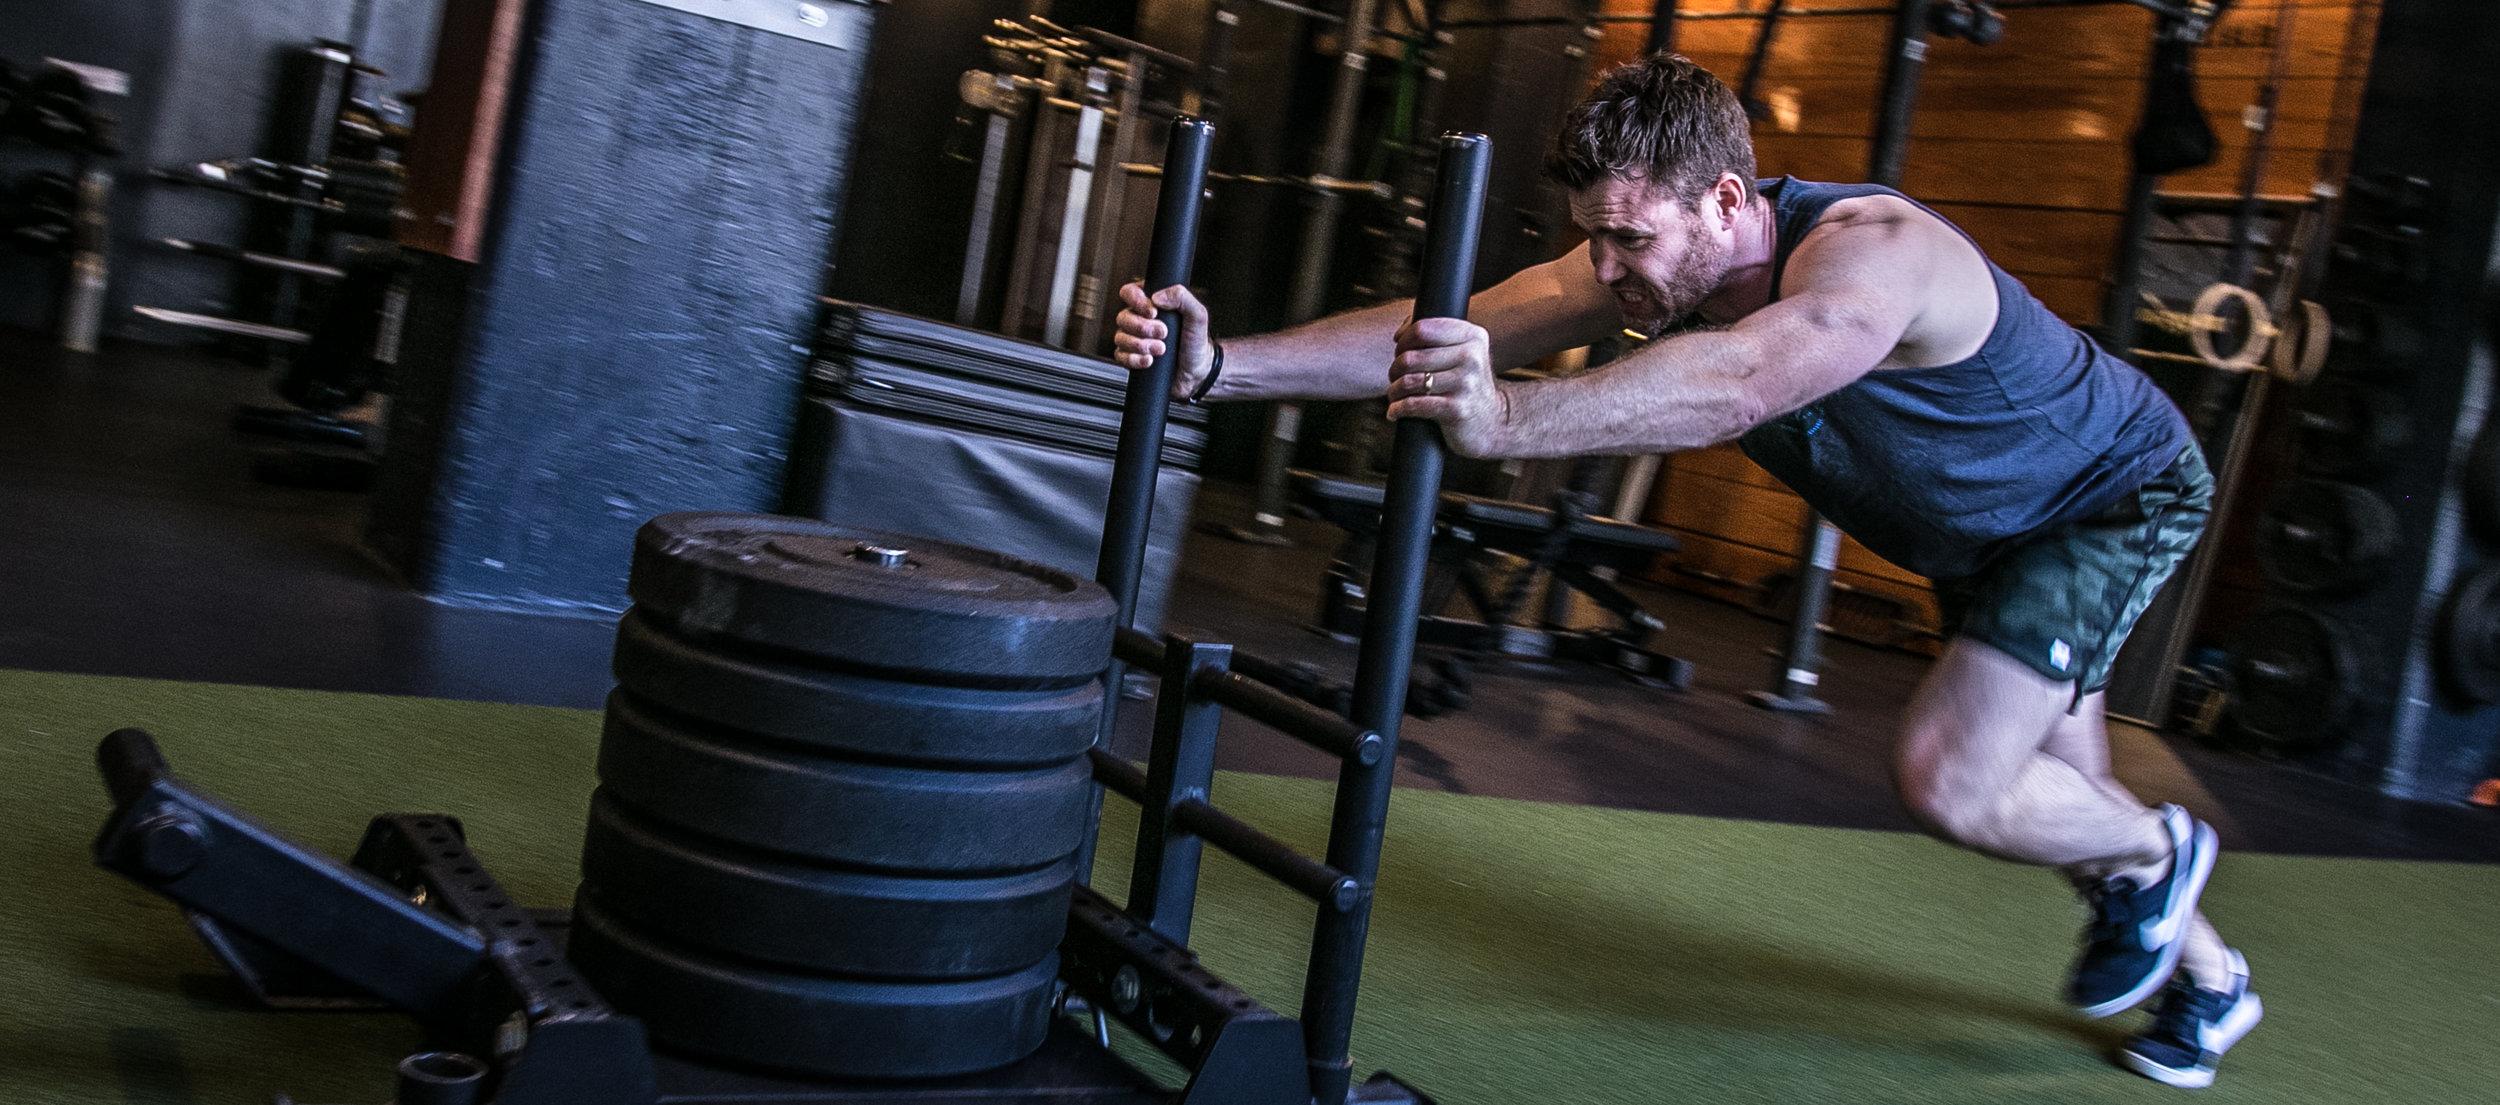 Gavin Birmingham sled push speed agility strength SAQ Sports Performace Specialist.jpg